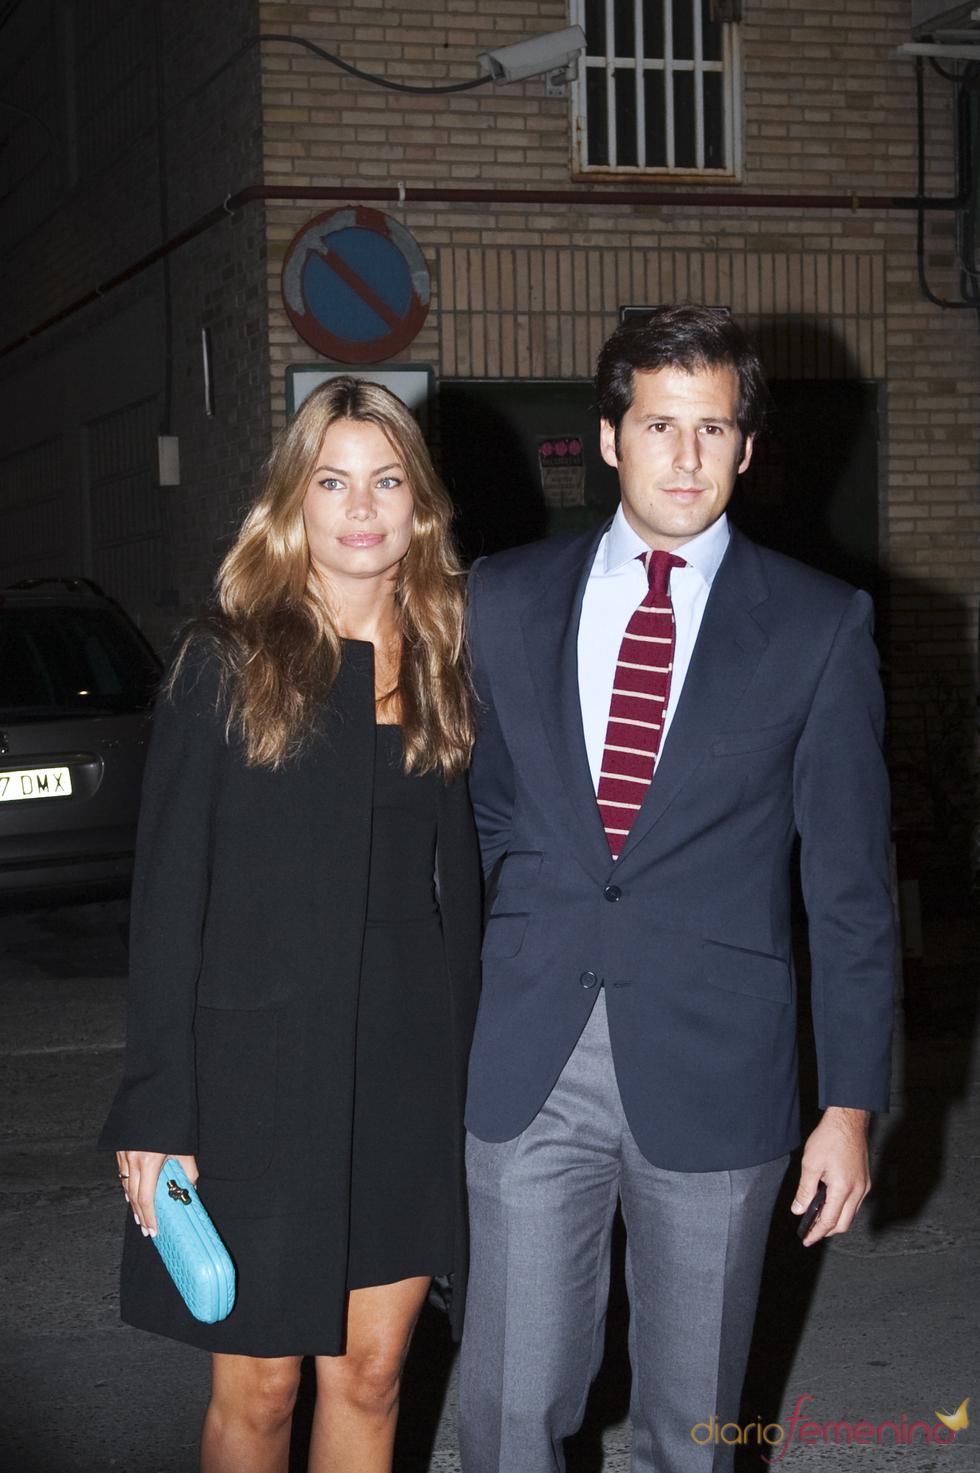 Carla Goyanes y Jorge Benguria se casan en 2011